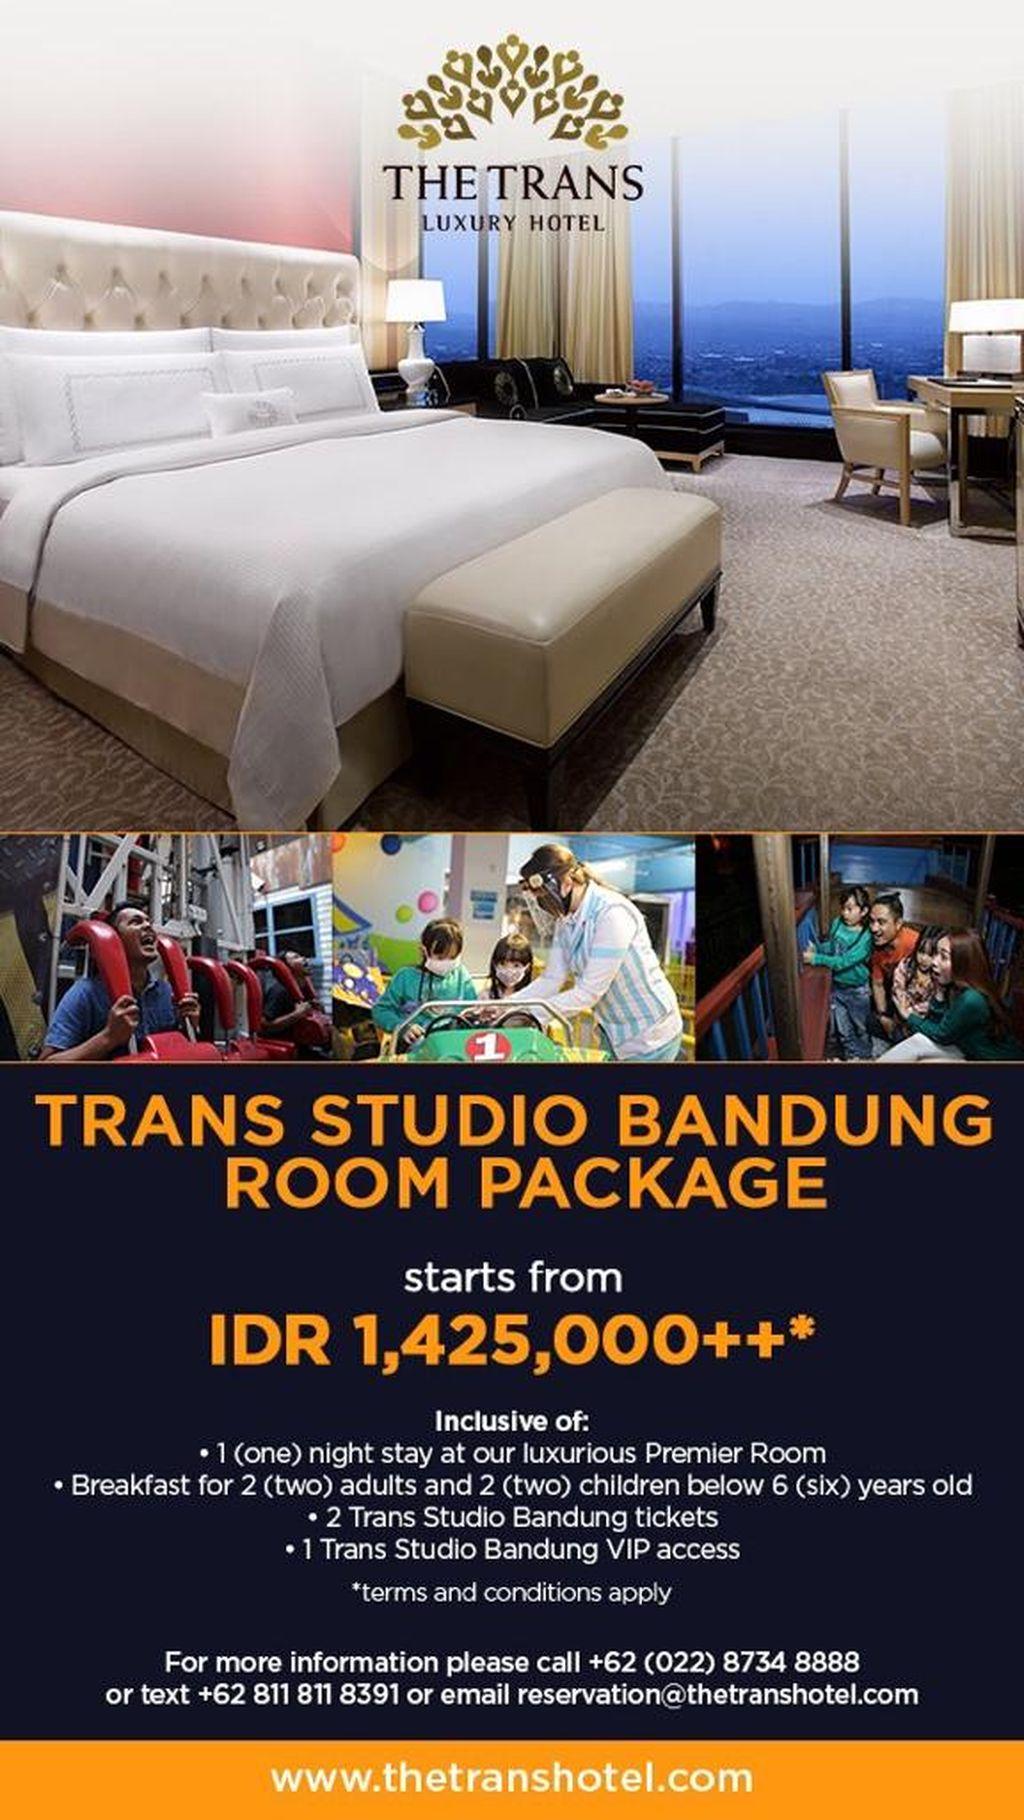 Trans Studio Bandung Room Package